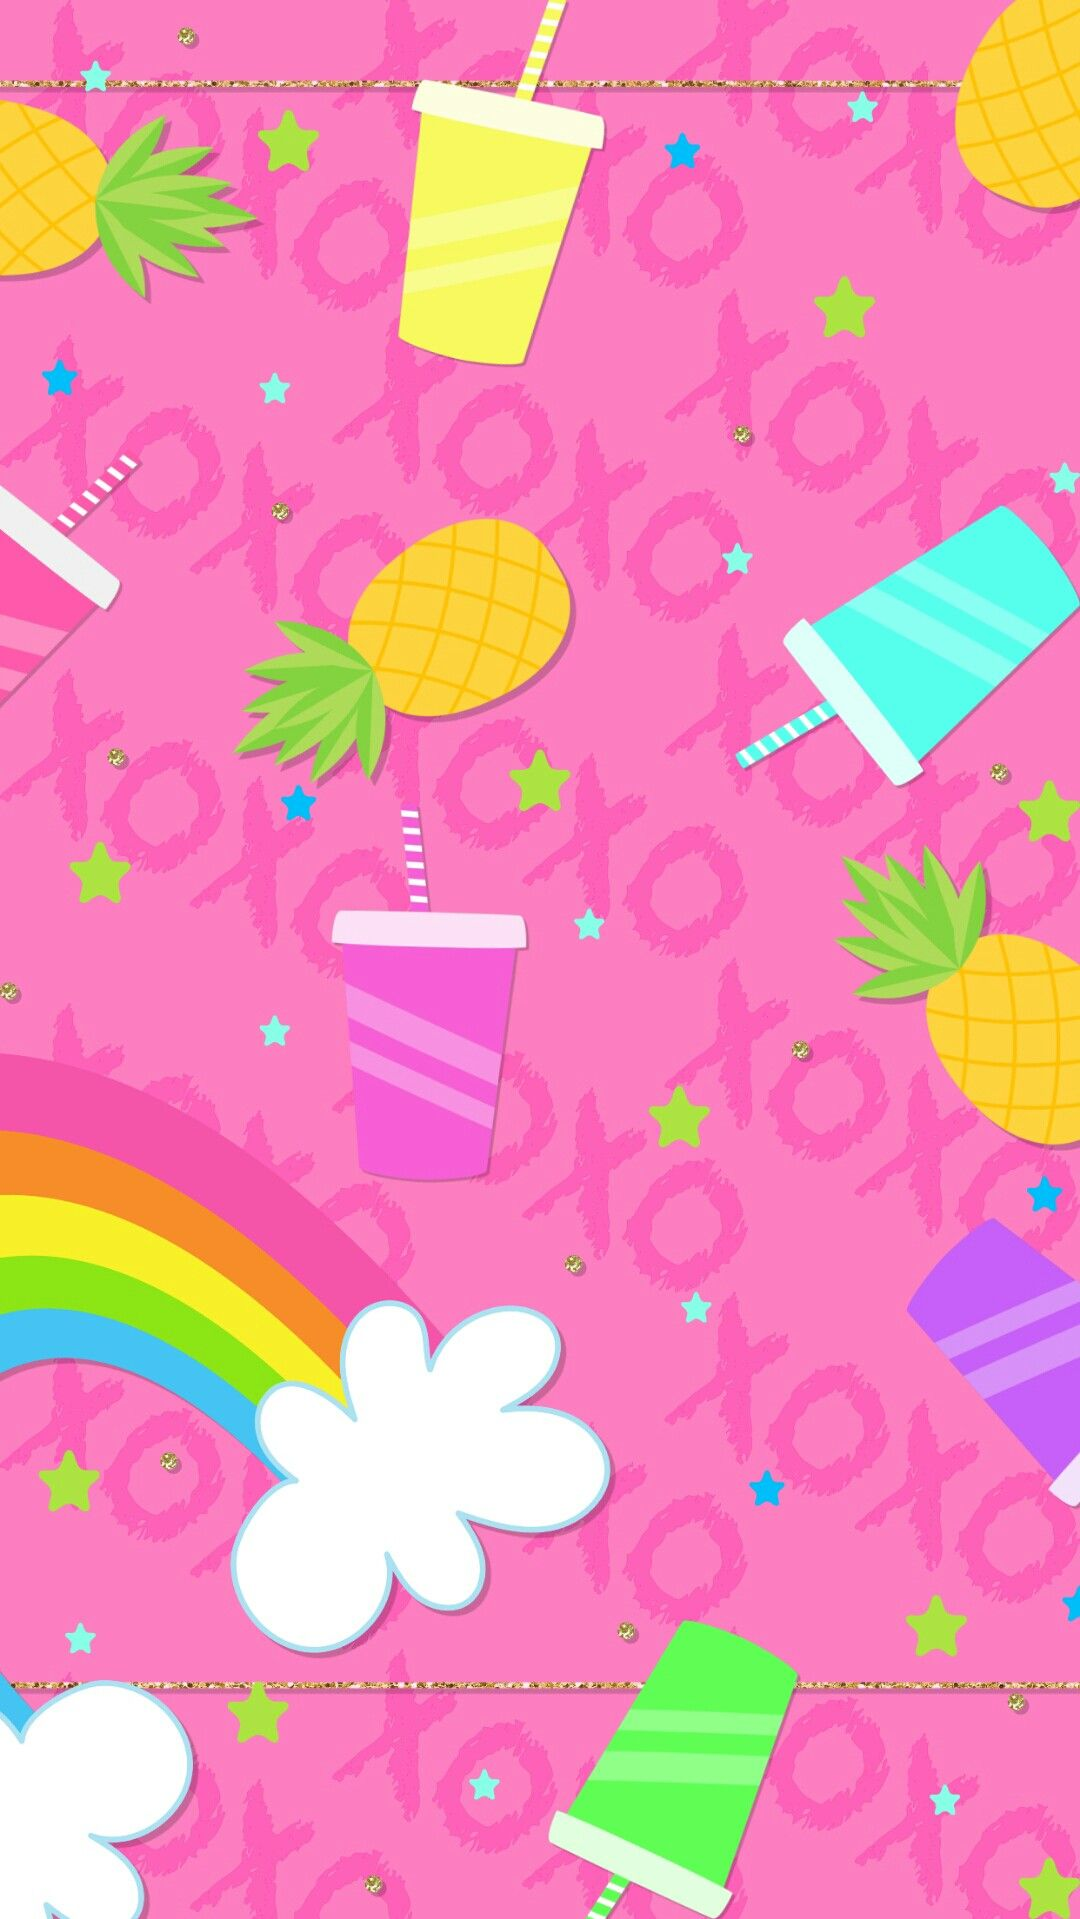 Beautiful Wallpaper Hello Kitty Smartphone - 81f487a8e72f80a3a5550d65aa0c87d6  2018_988916.jpg